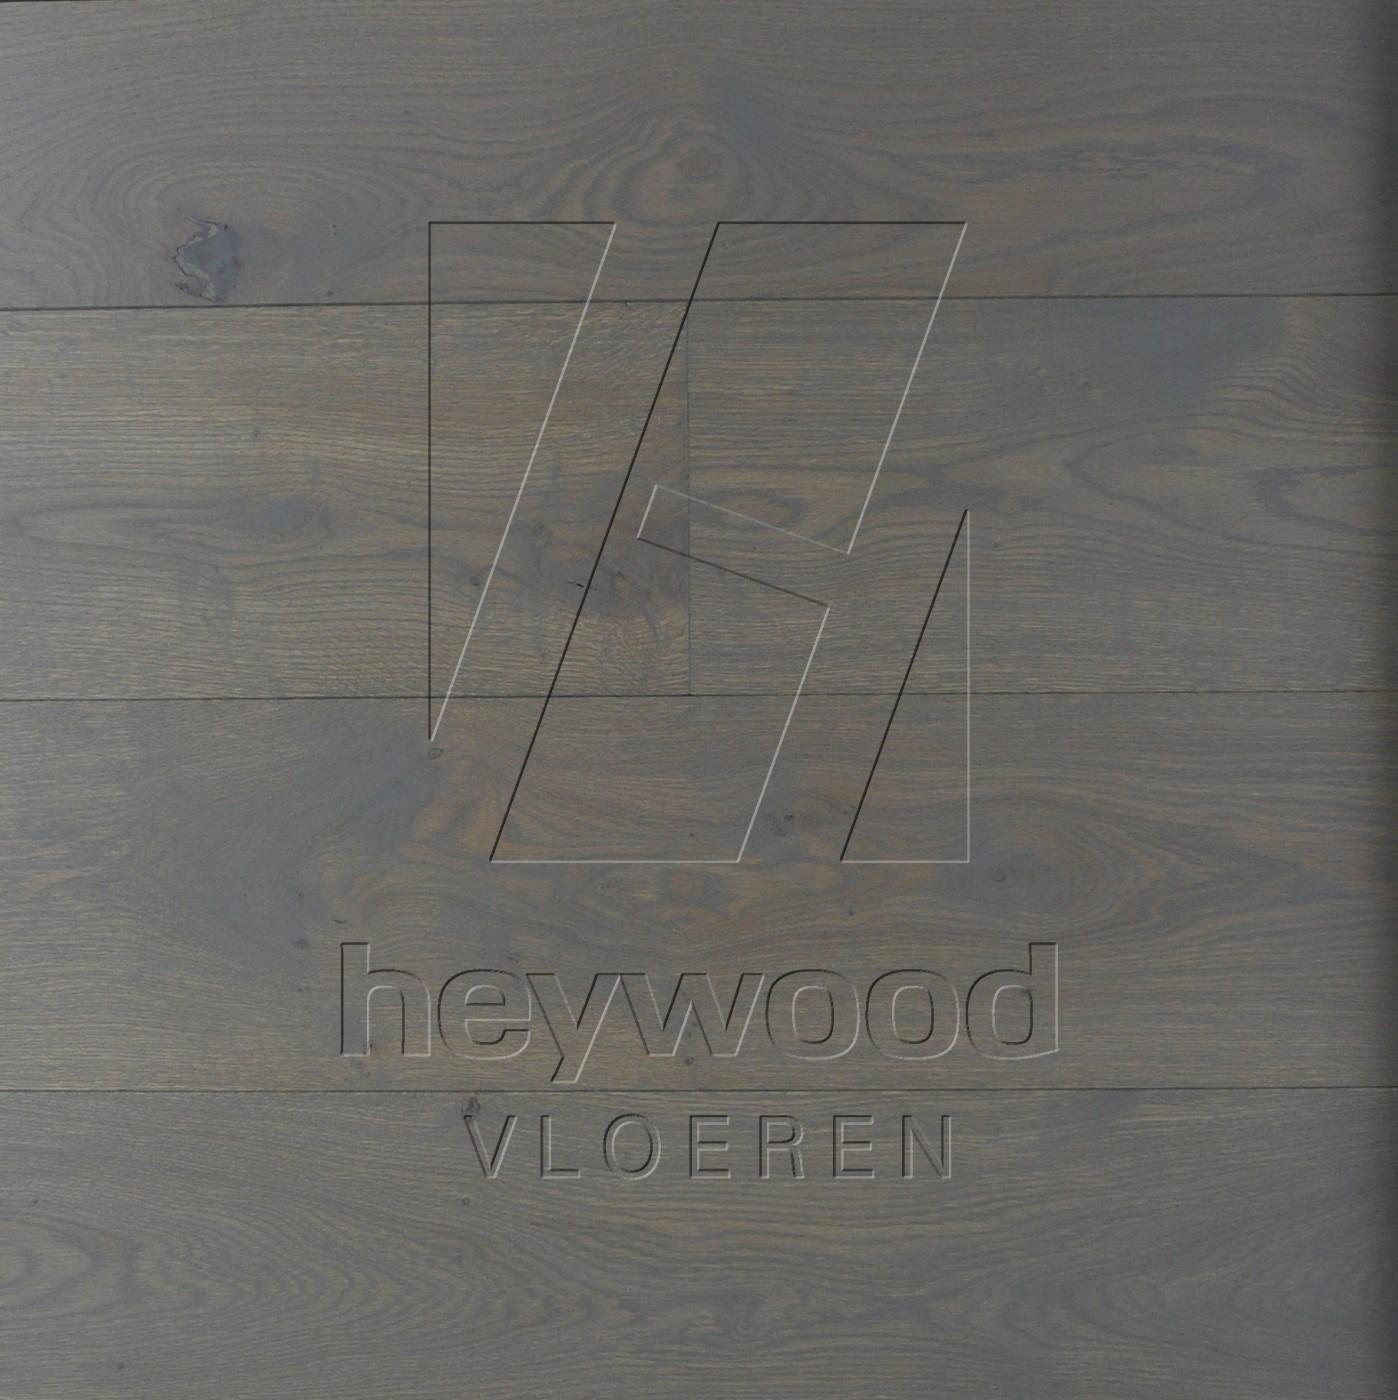 Esbjerg in European Oak Character of Bespoke Wooden Floors